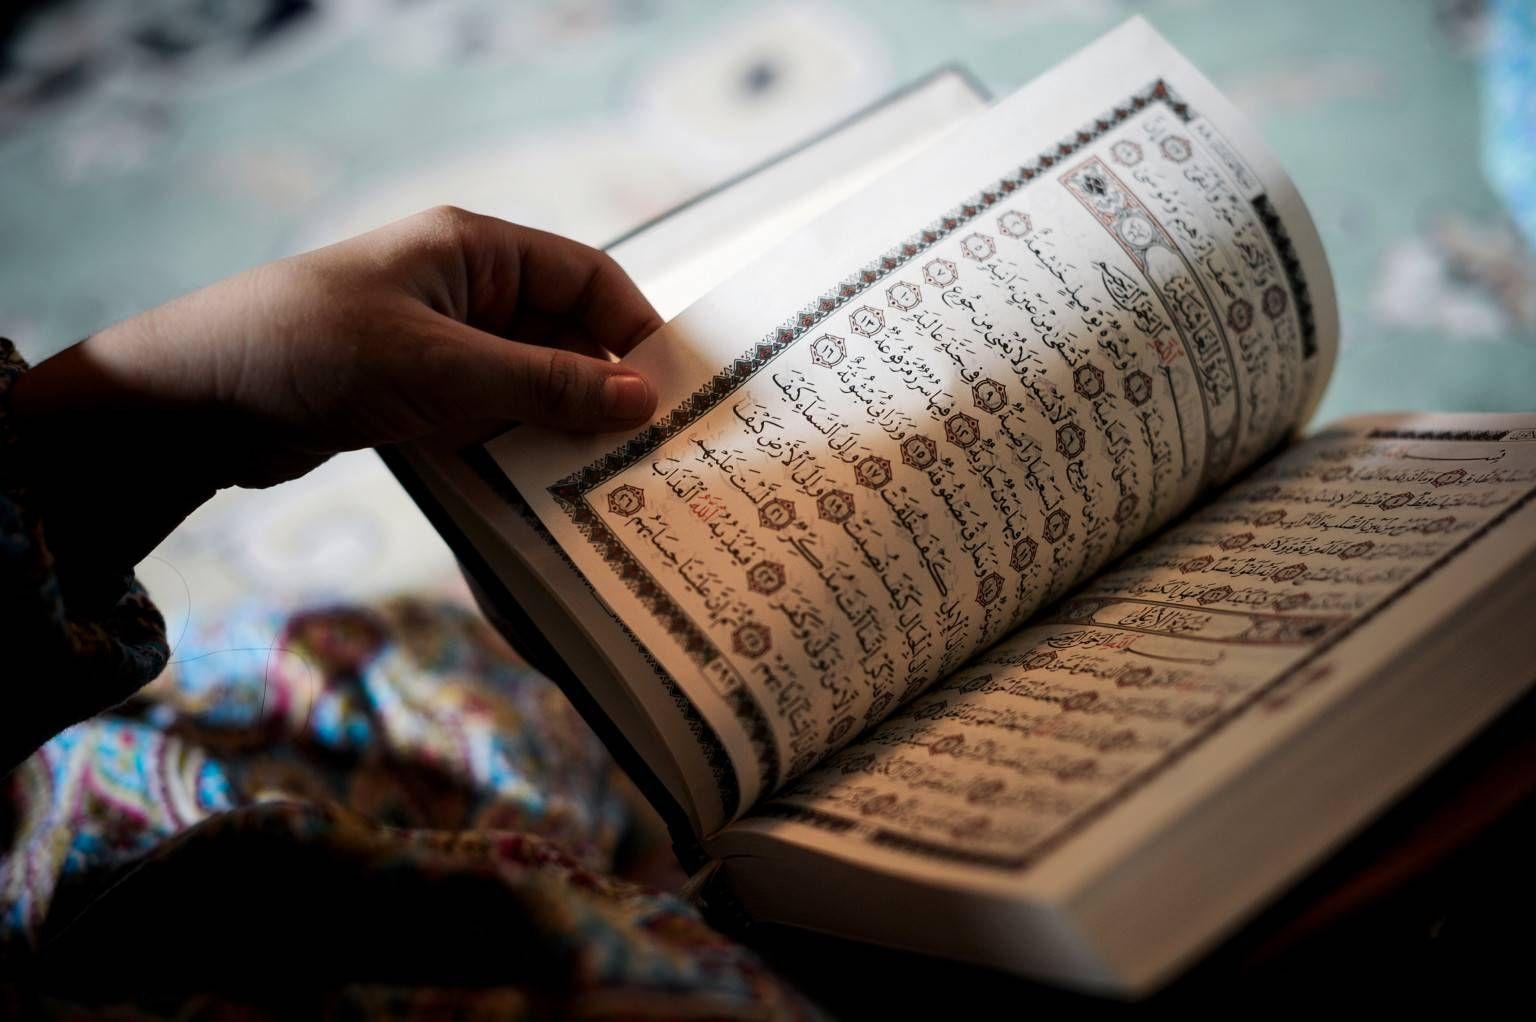 8 Steps To Recite The Entire Qur An This Ramadan About Islam Beliebte Bucher Bucher Einfache Frisuren Mittellang